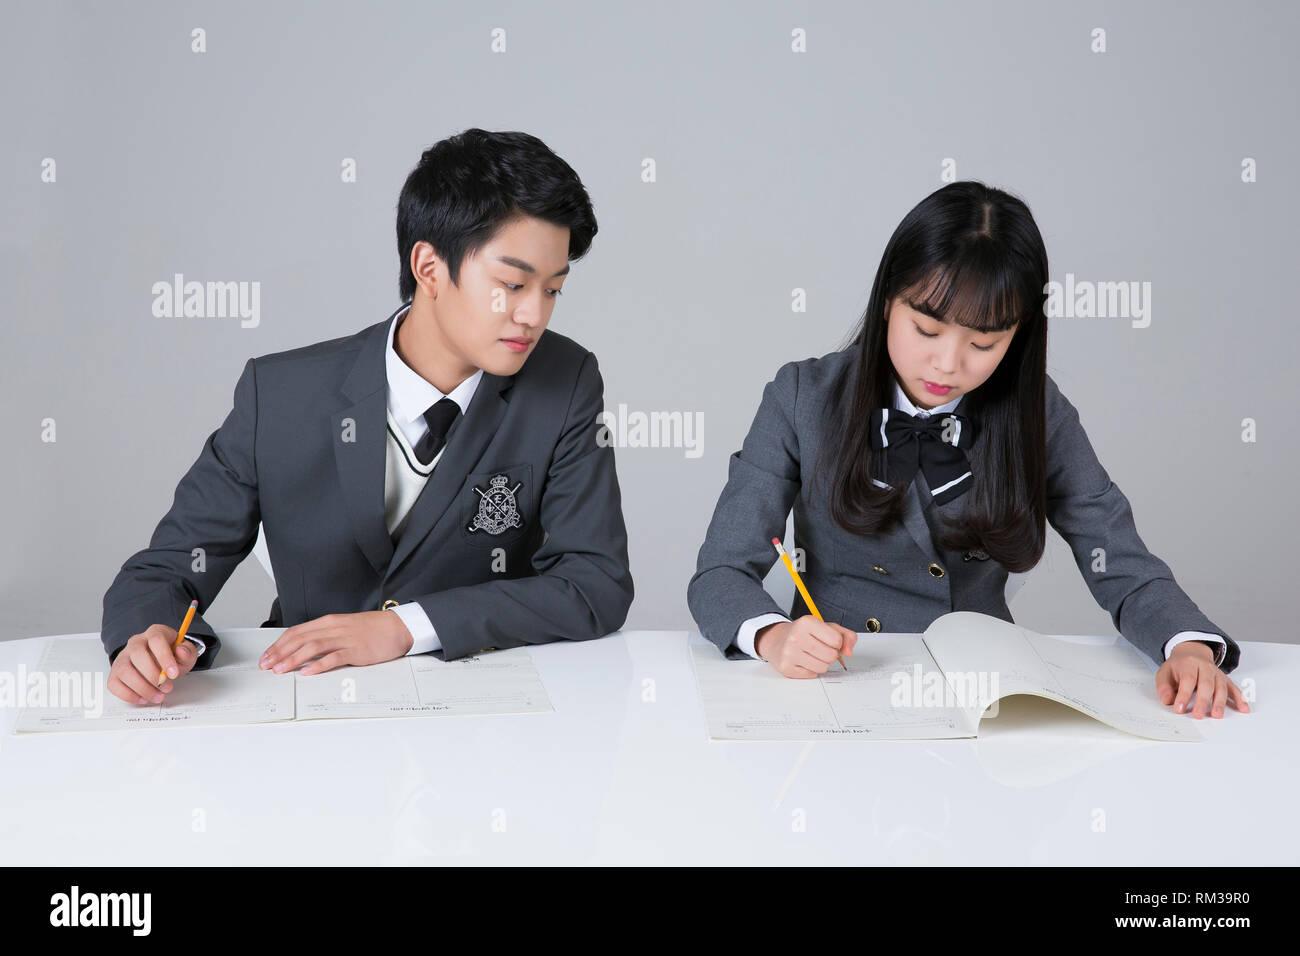 Life of high school students, senior school students concept photo 278 - Stock Image